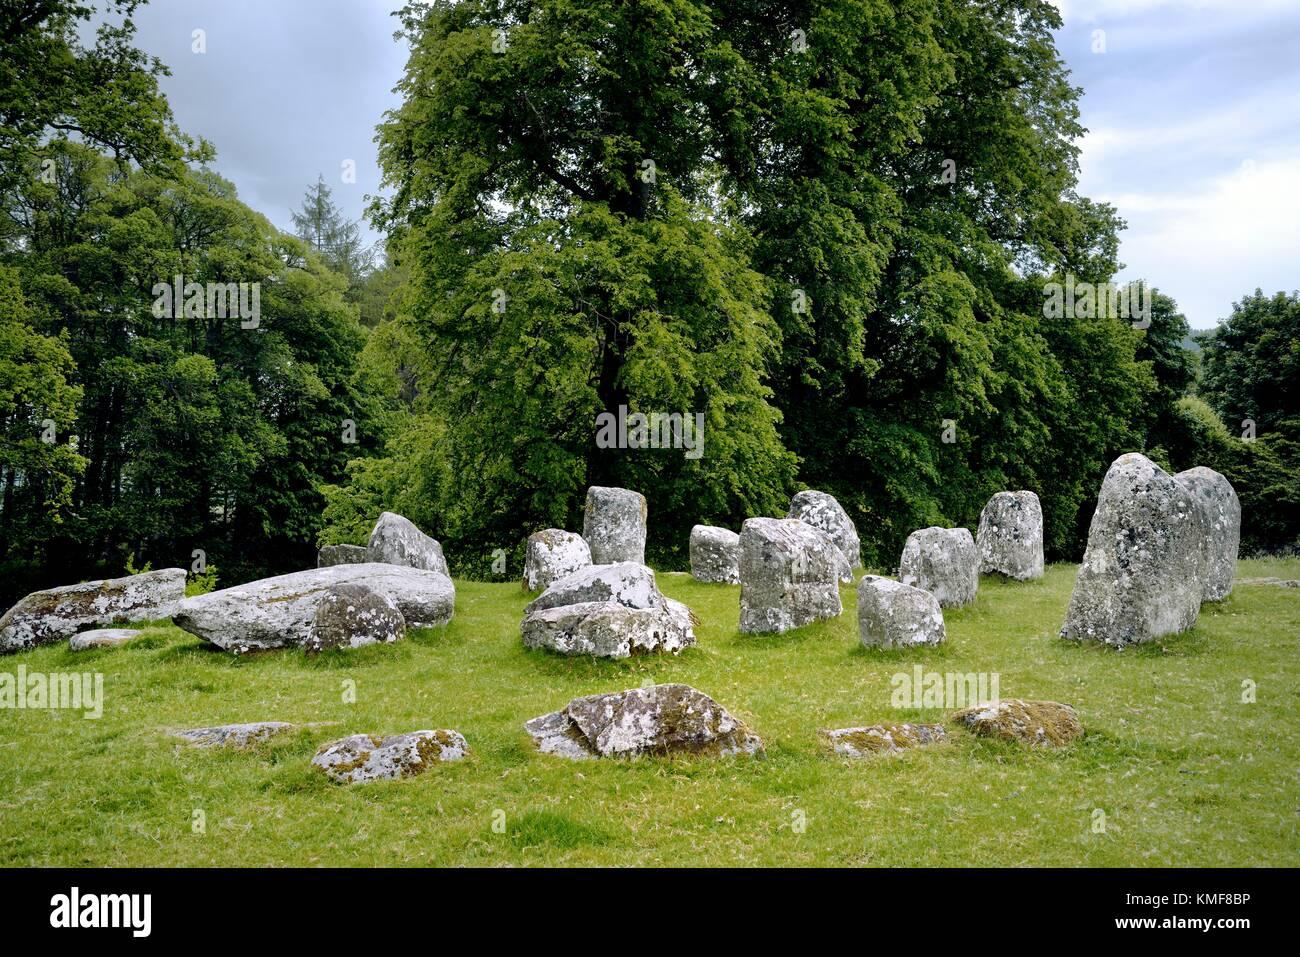 Croft Moraig Croftmoraig complex stone circle. Prehistoric site between Aberfeldy and Kenmore at NE end of Loch - Stock Image